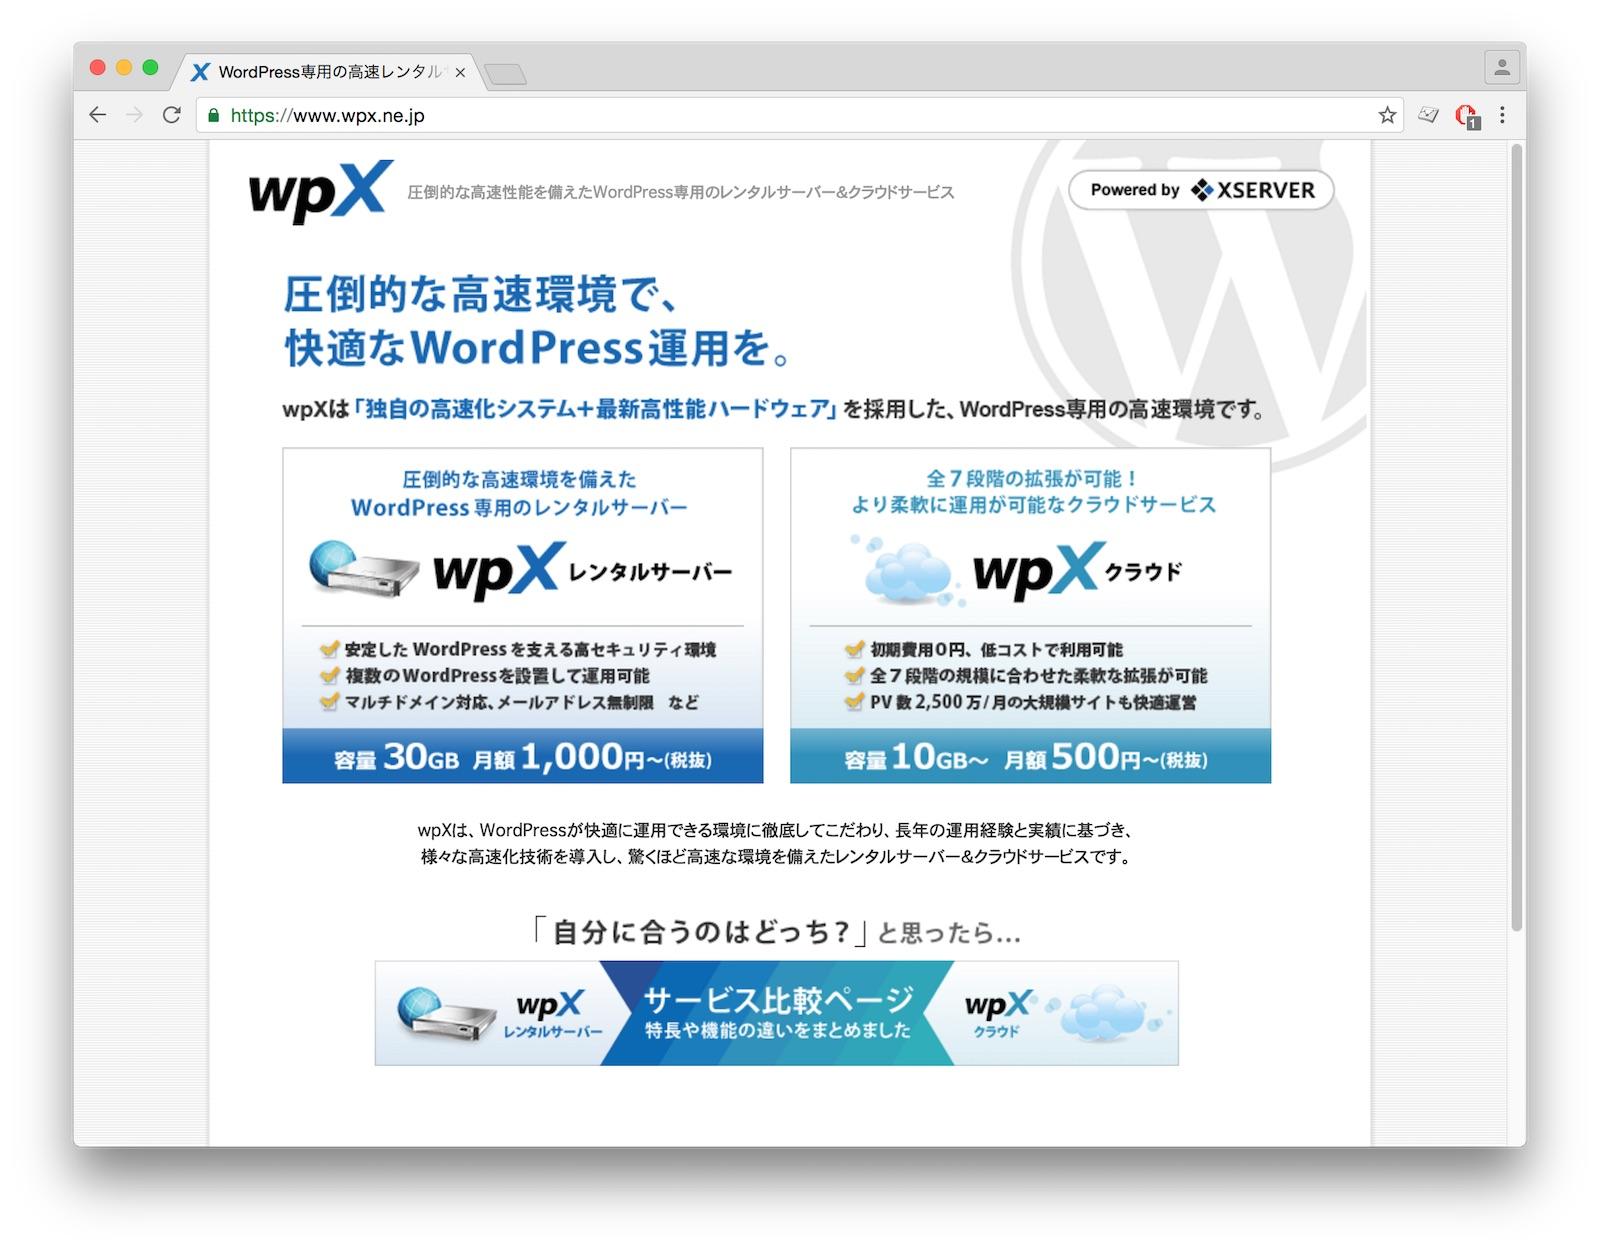 wpX公式サイト